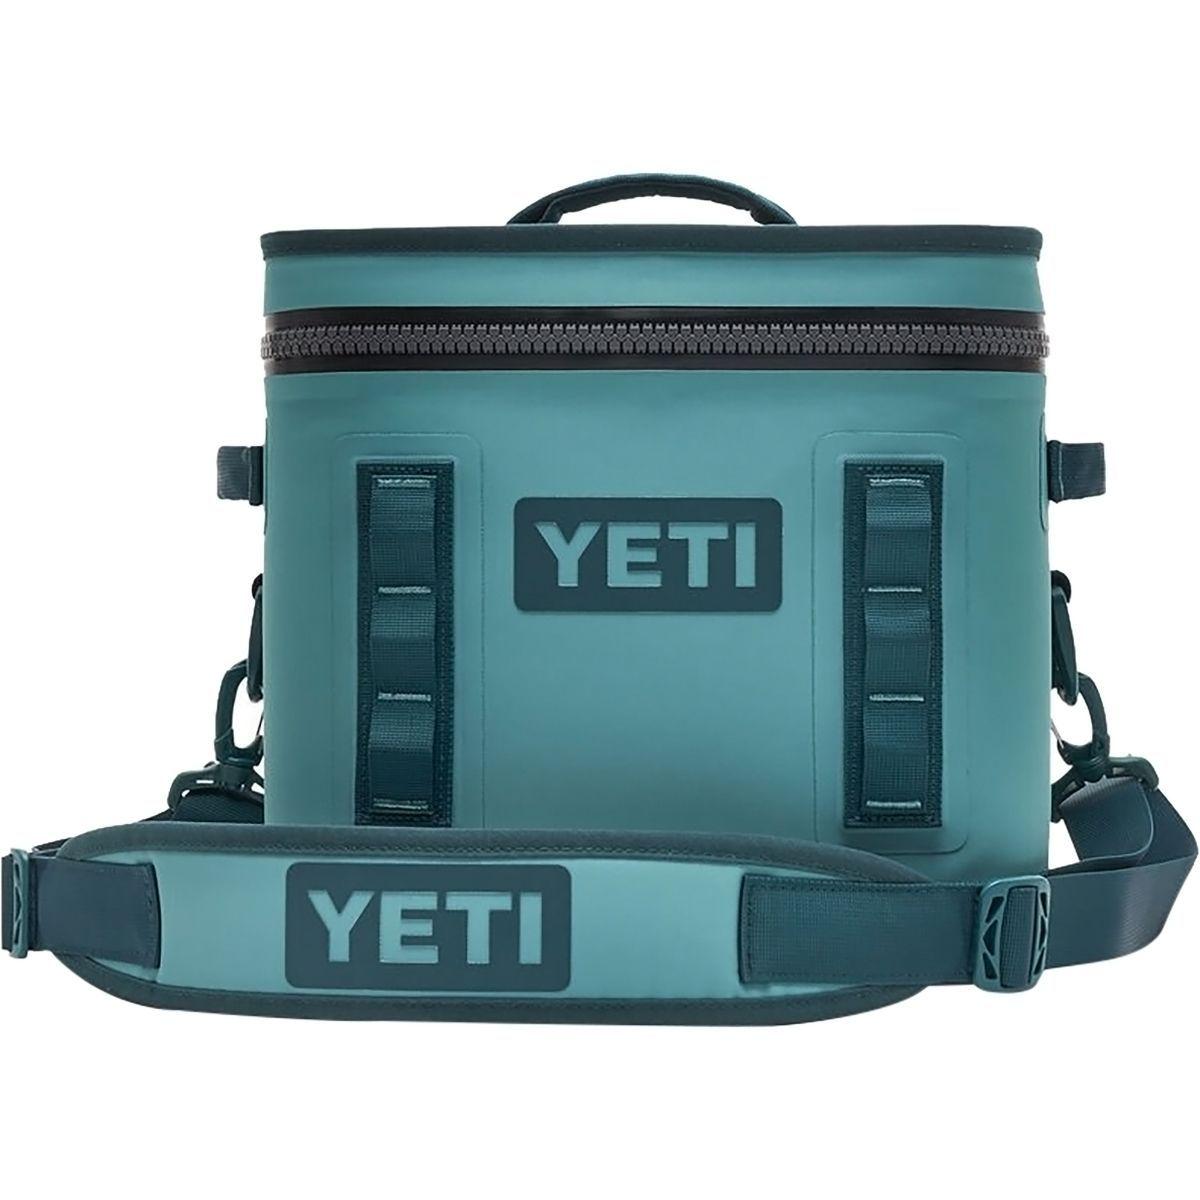 Hopper Flip 12 In 2020 Soft Cooler Portable Cooler Yeti